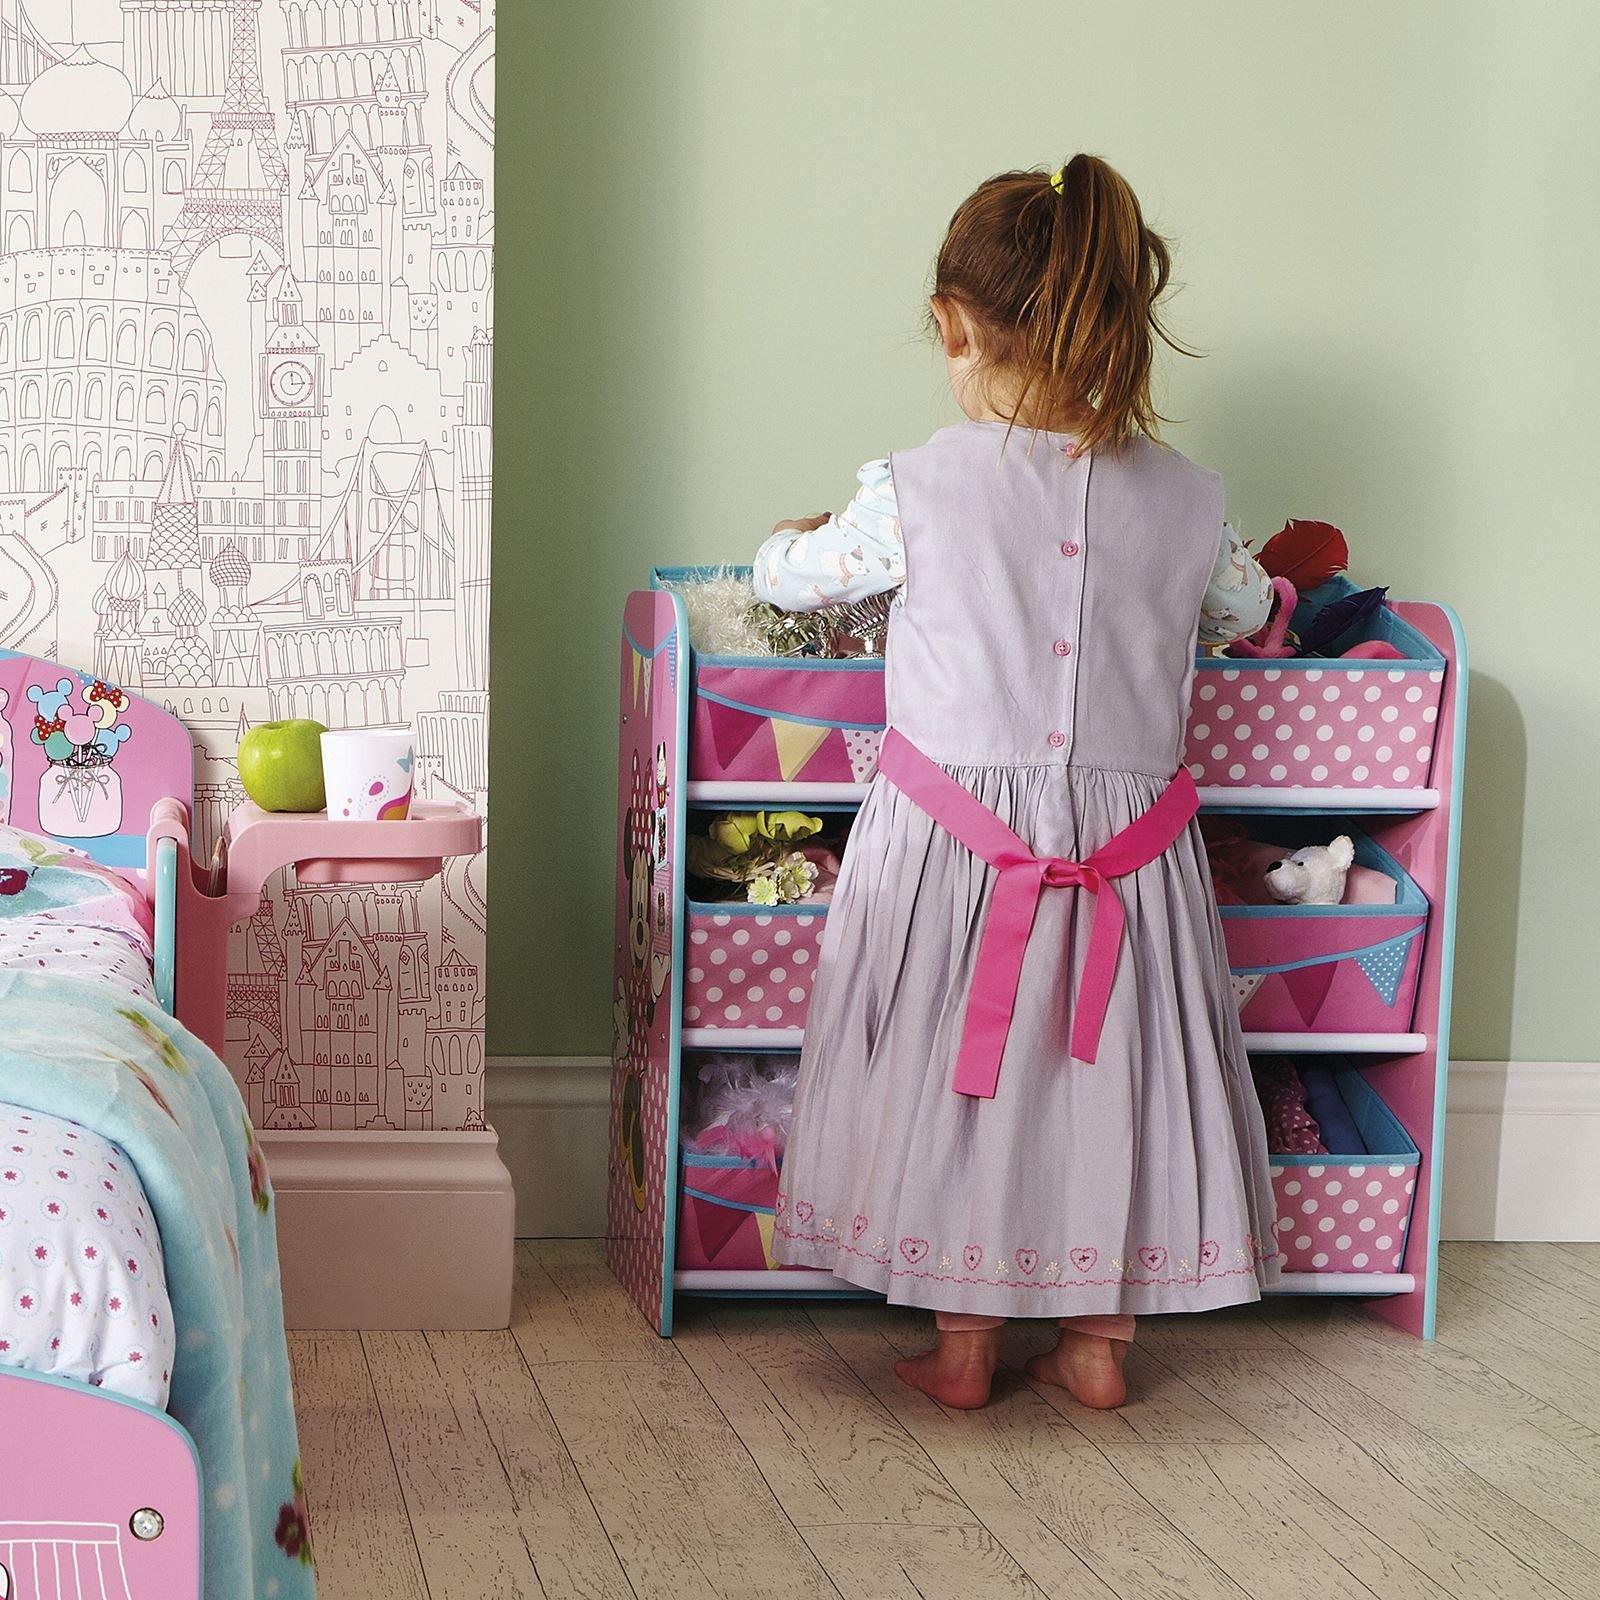 Minnie Mouse Bedroom Furniture Best Of Details About Kids Character 6 Bin Storage Unit Bedroom Furniture Disney Peppa Pj Masks